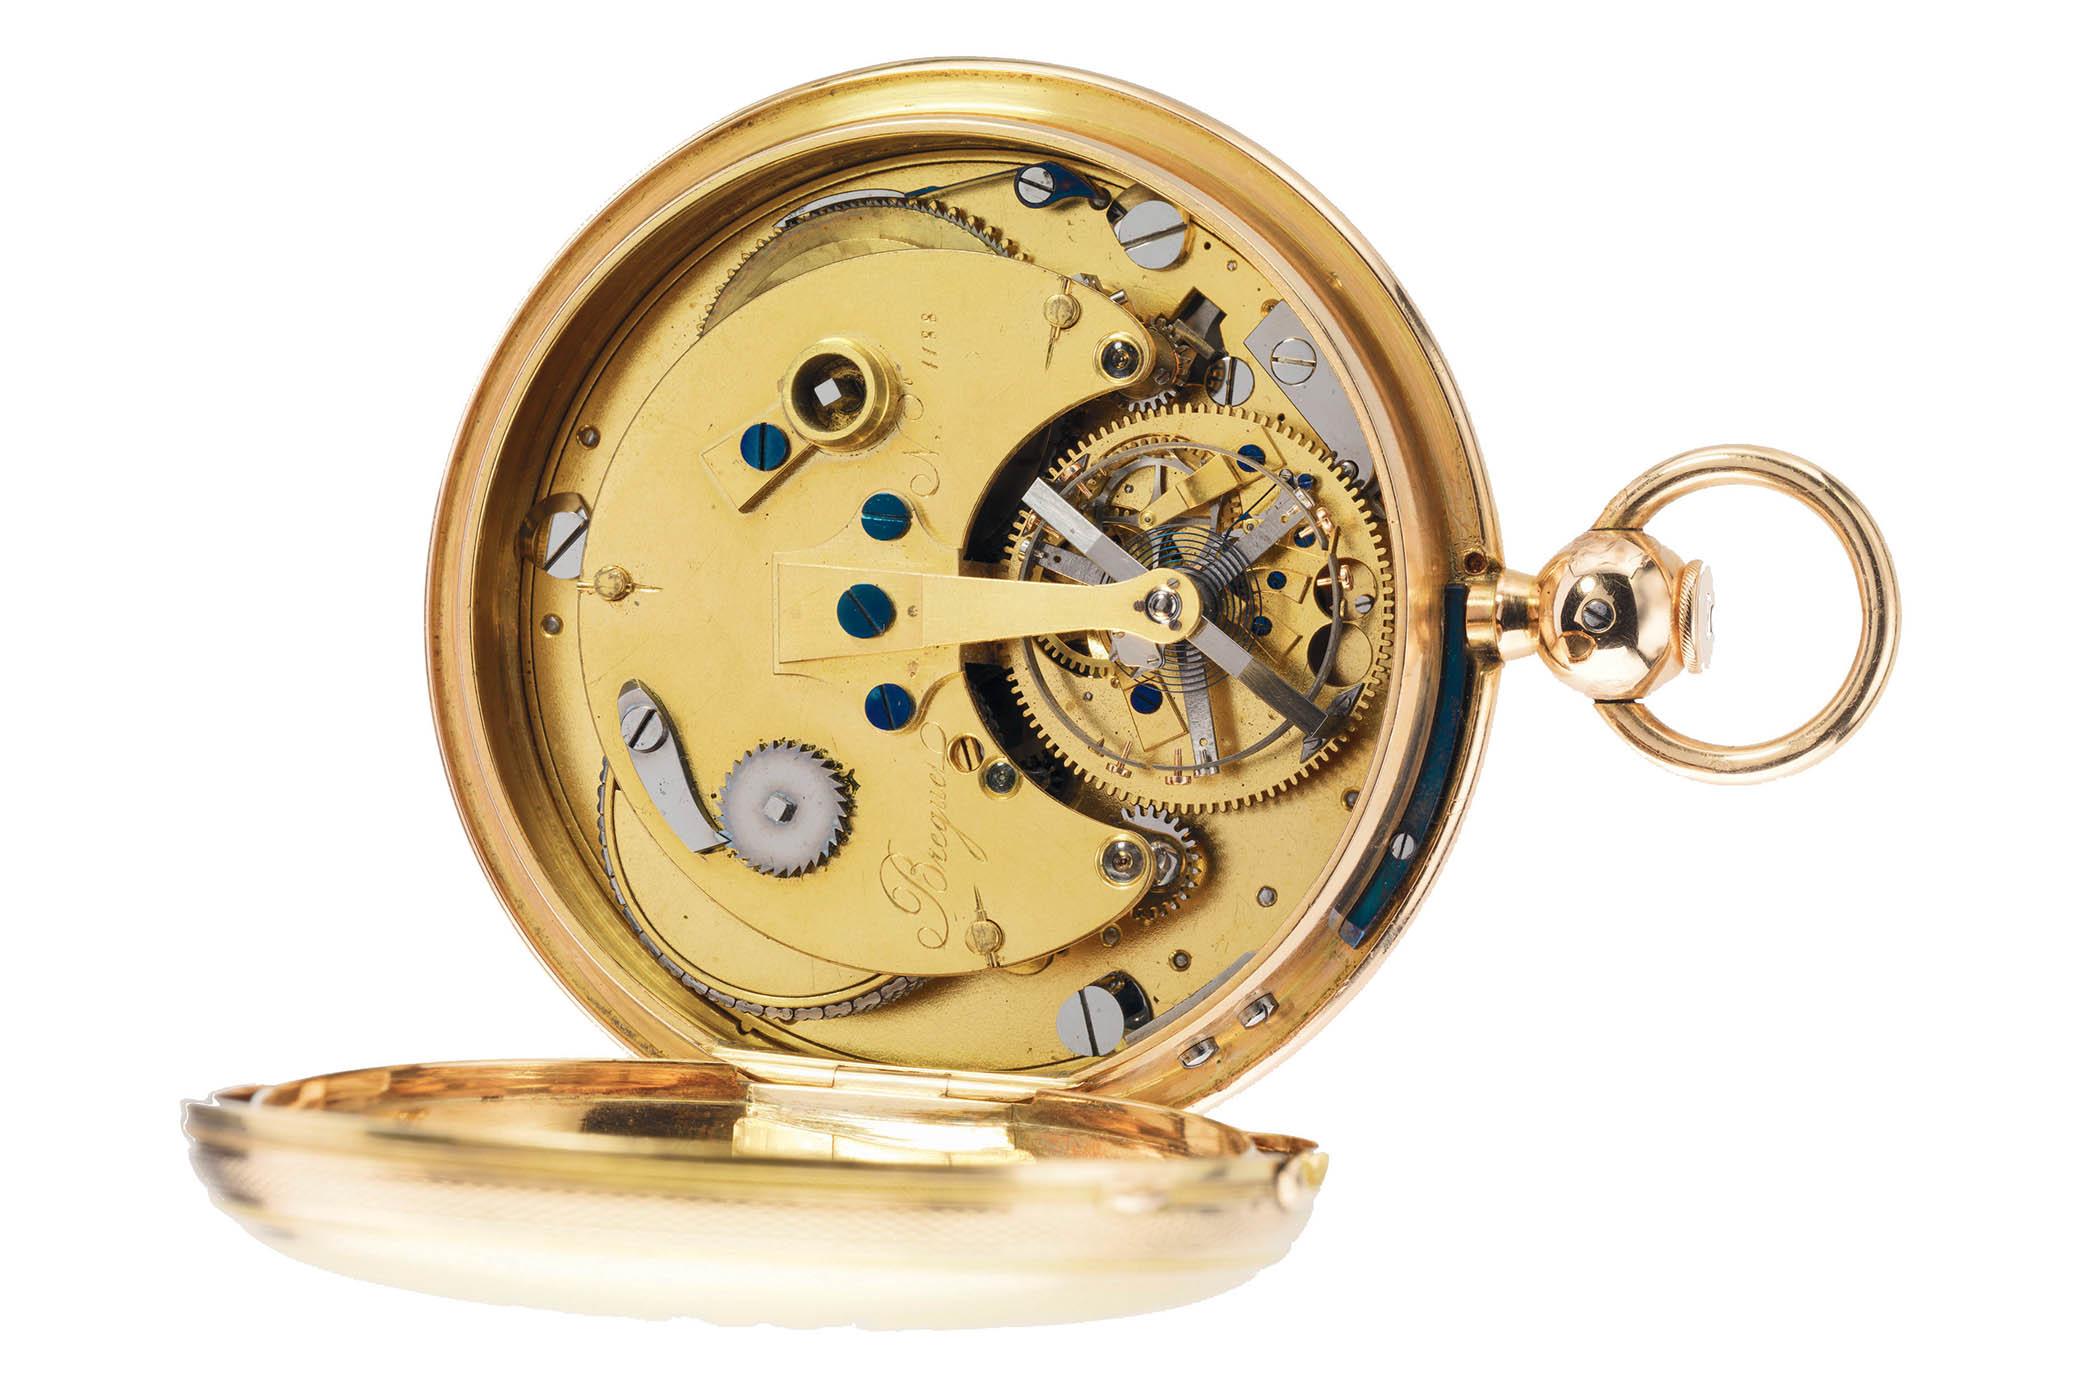 Breguet tourbillon precision pocket-watch No. 1188